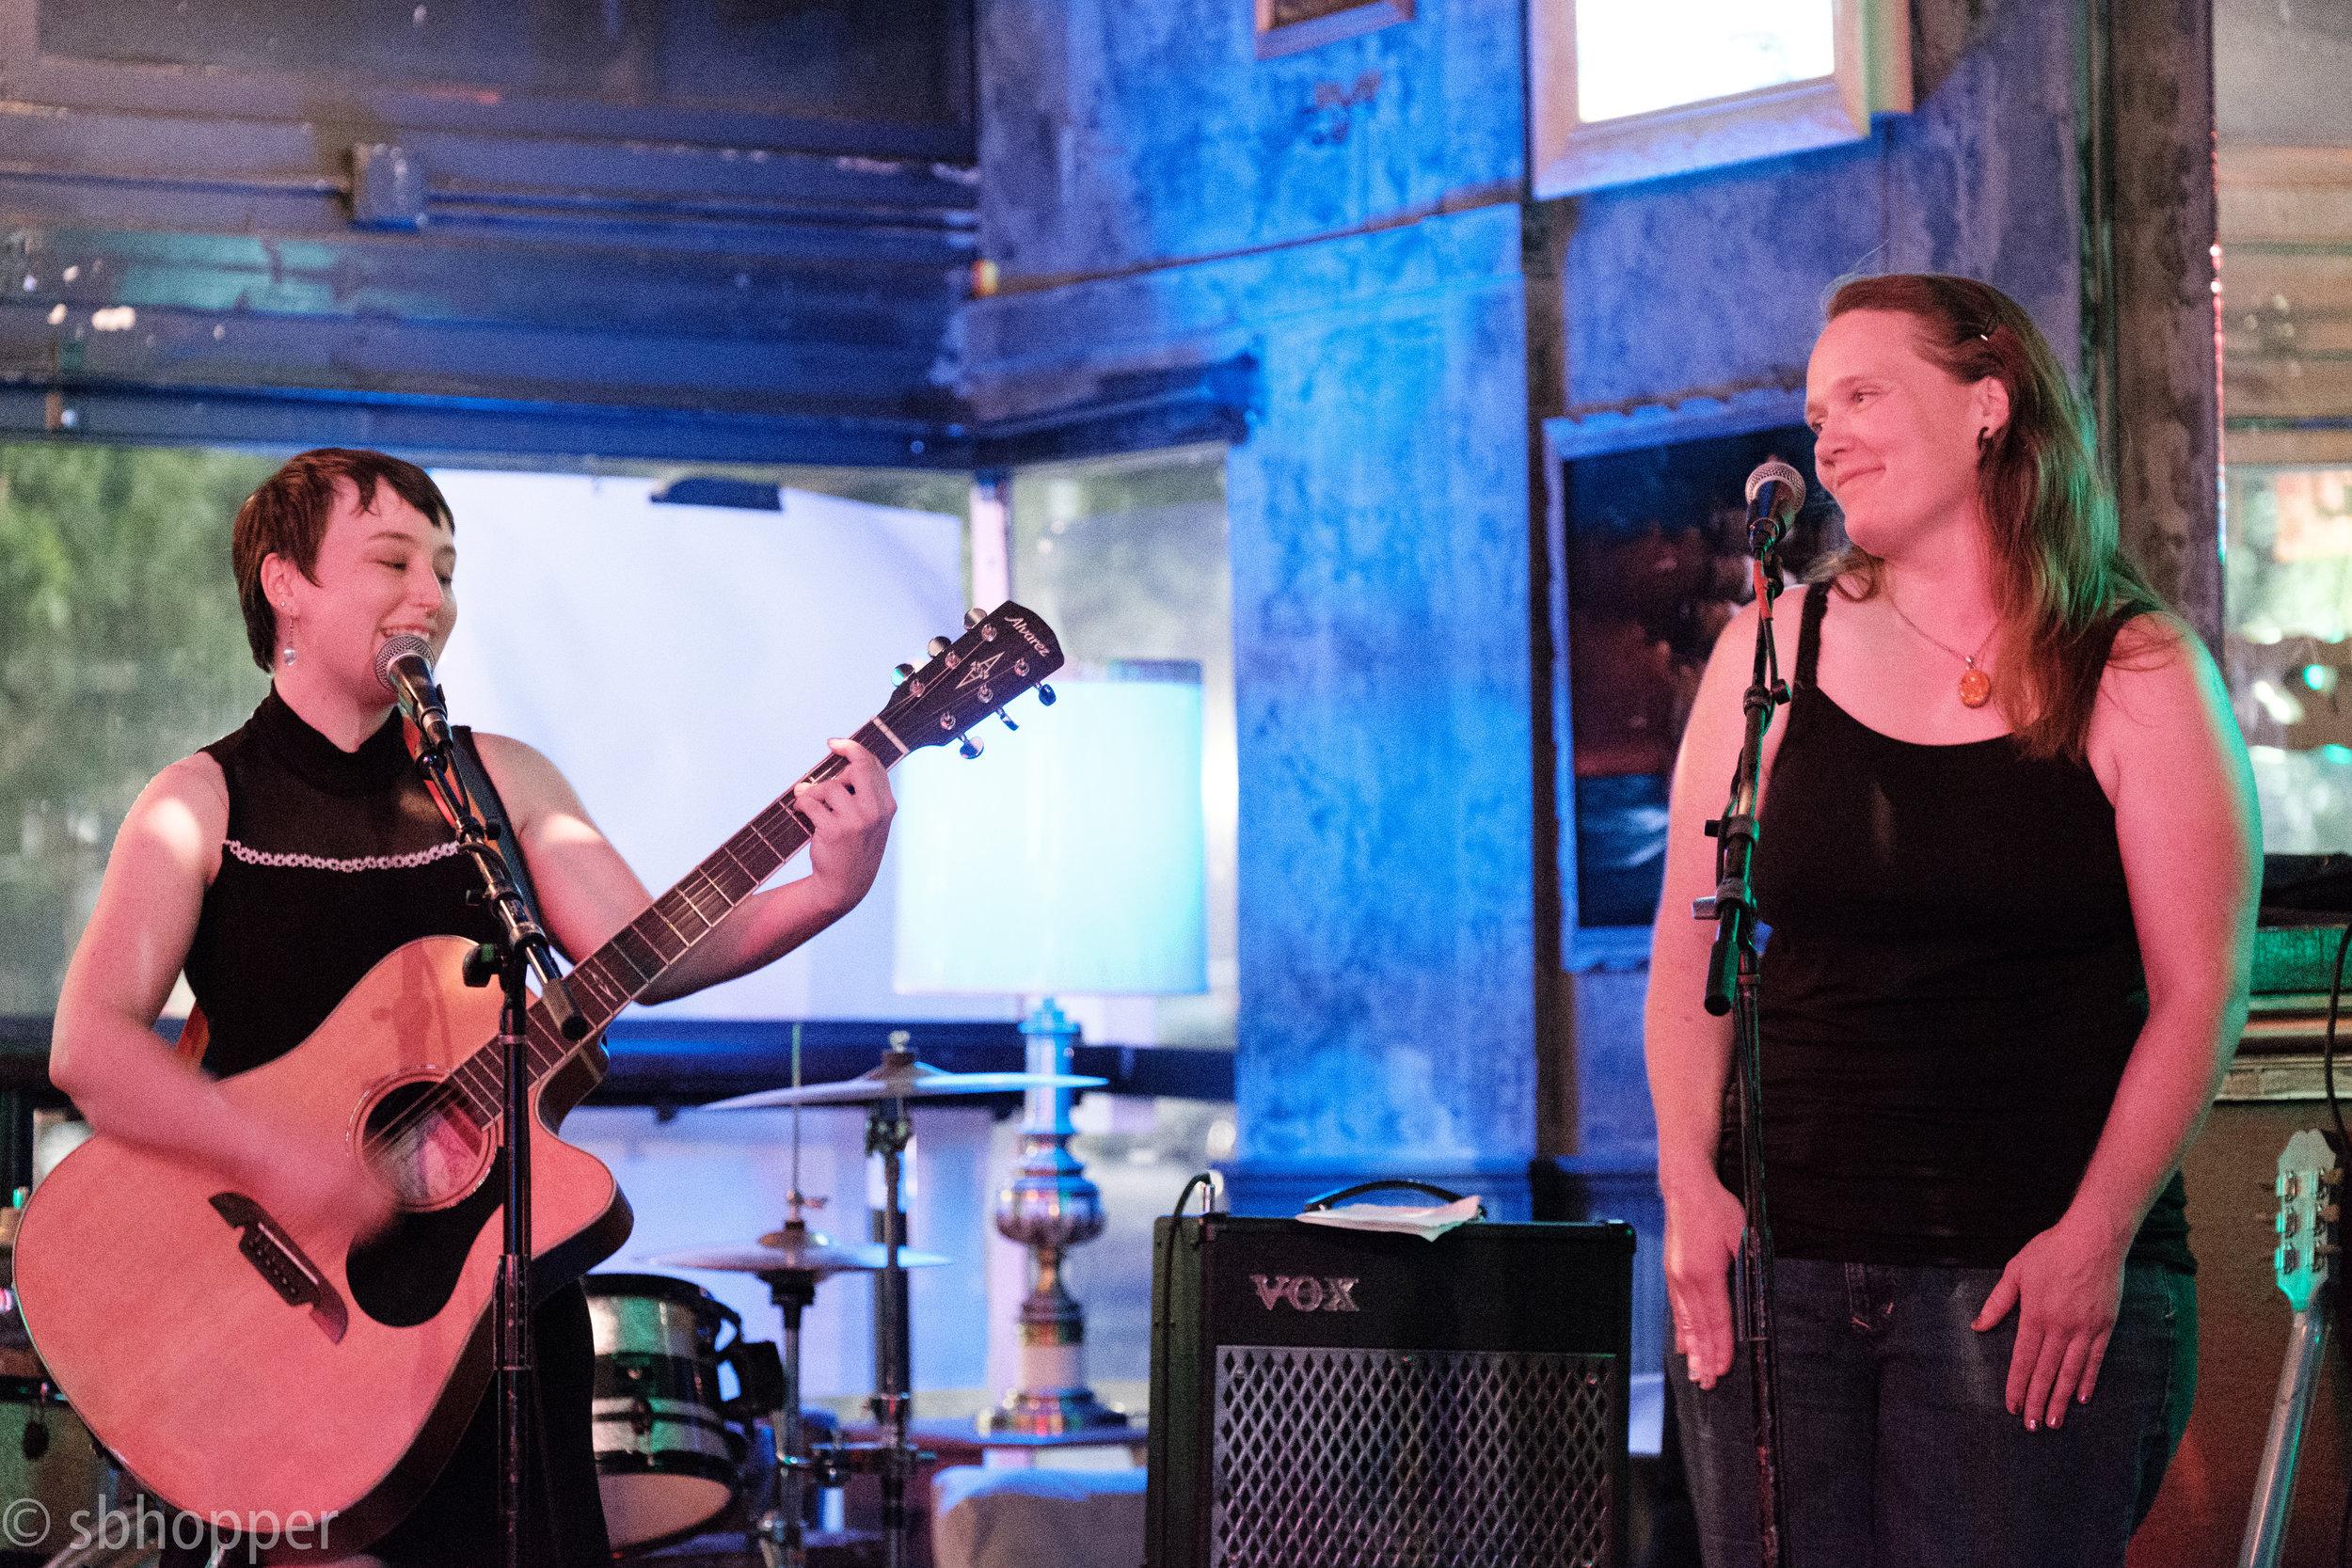 A Greene and Sandi Fernandez at Chop Suey, Seattle, 6 August 2017.